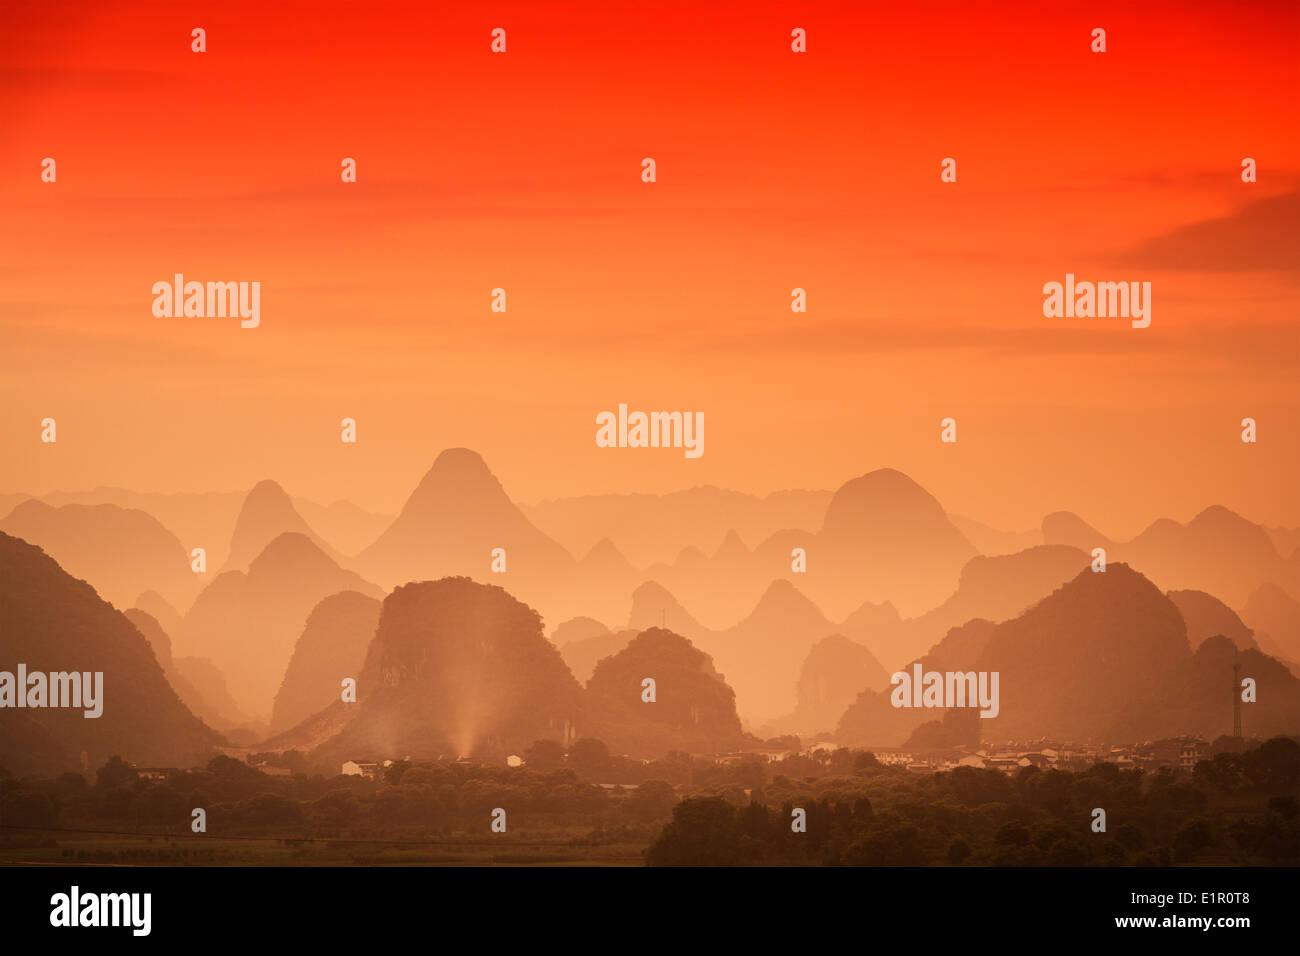 Karst, paisaje de montaña en Guilin, Guangxi, China. Imagen De Stock